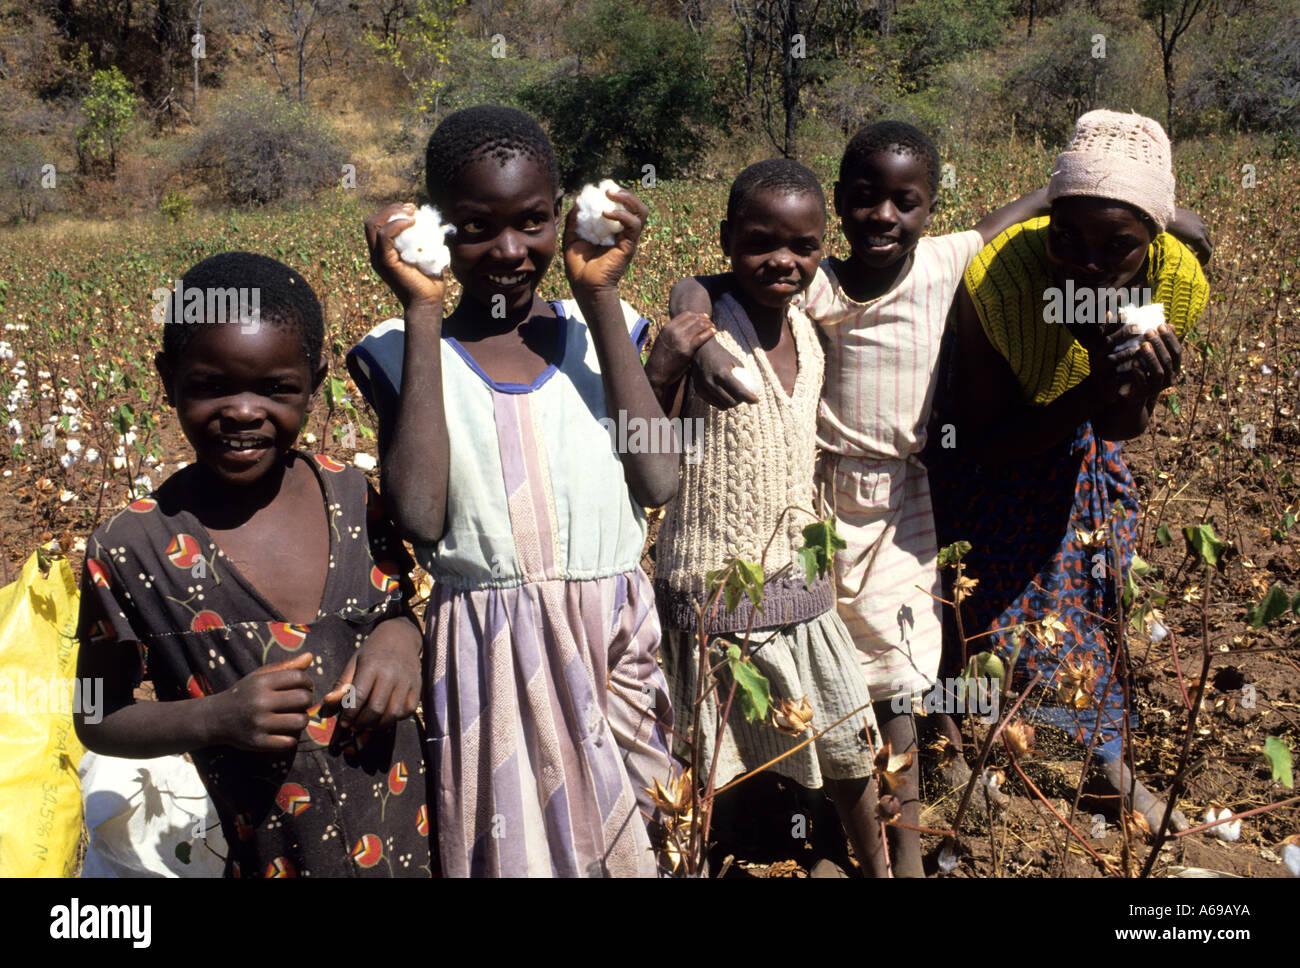 children picking cotton in Zimbabwe South Africa - Stock Image